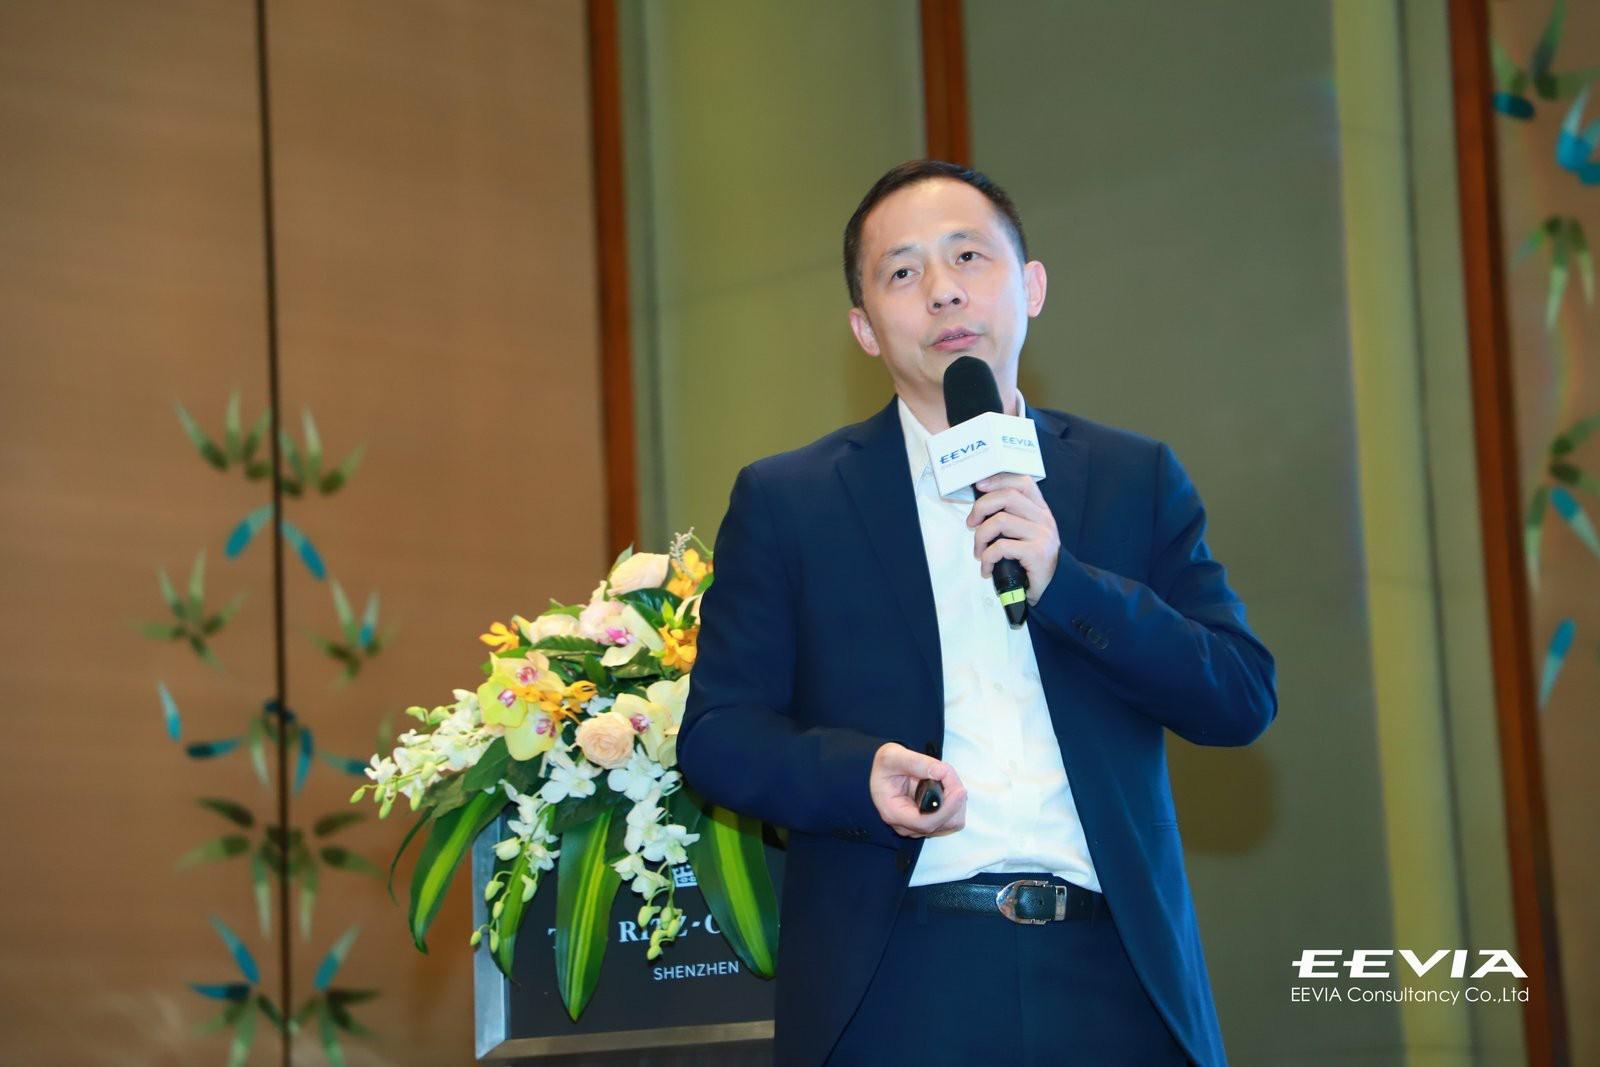 Qorvo中國區移動事業部銷售總監-江雄 演講圖片備選1.jpg